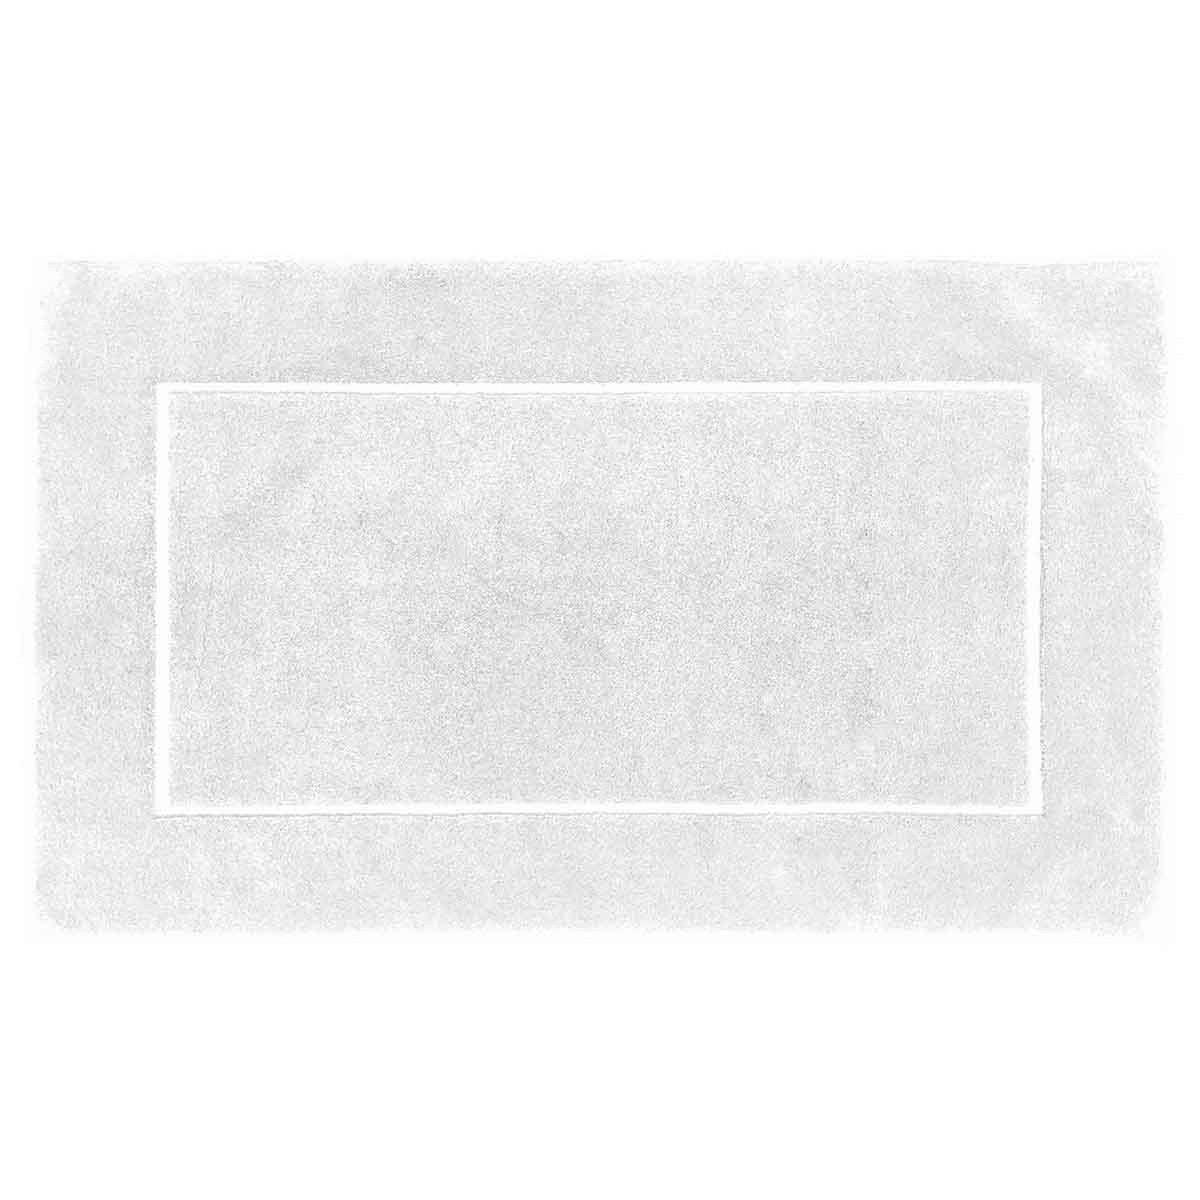 Tapis de bain 60x100cm 1000gr/m² Blanc